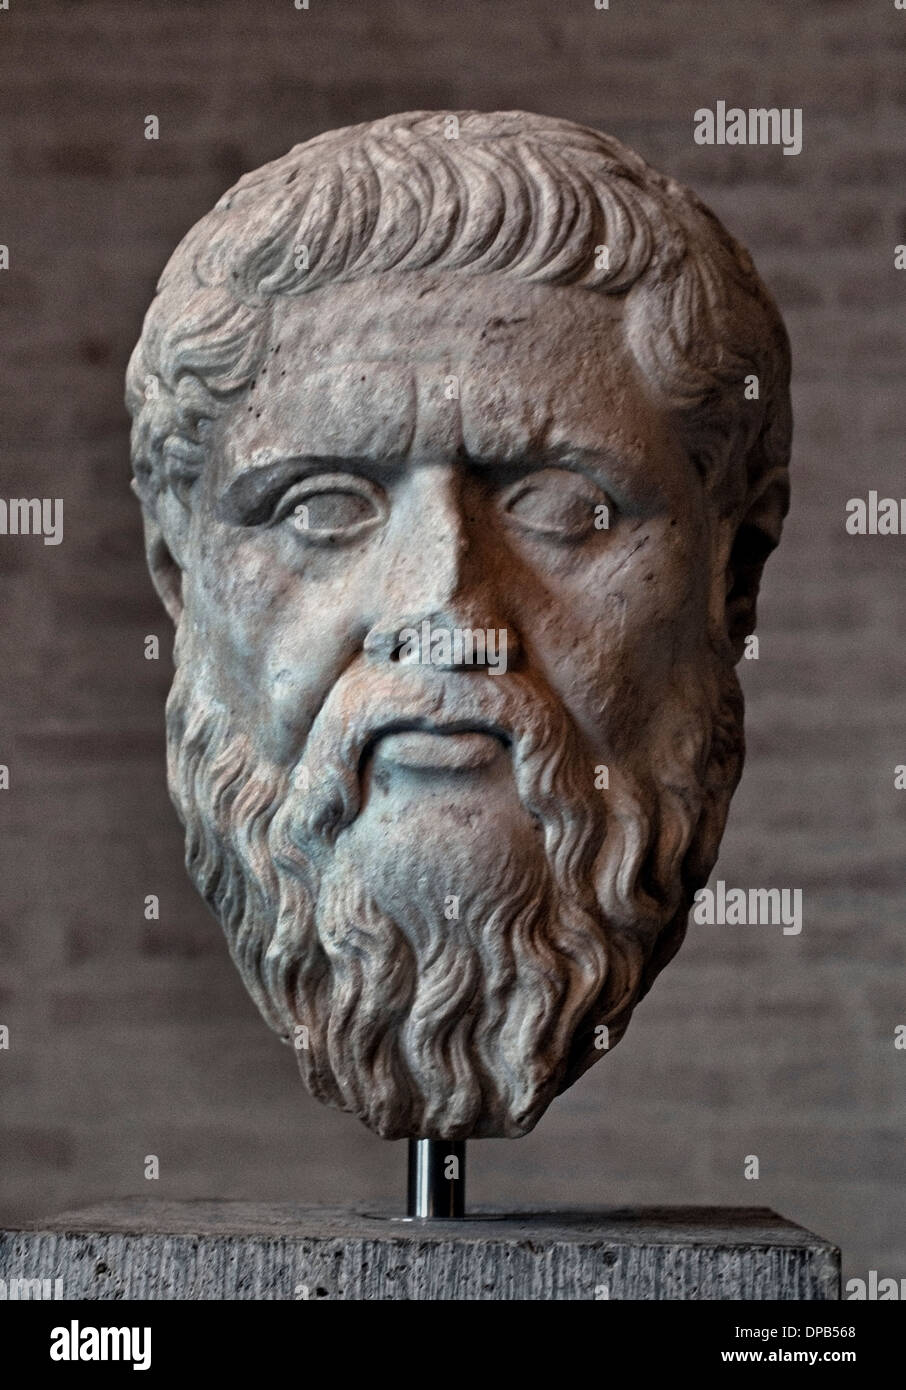 Plato or Platon 427–c. 347 BC philosopher philosophy Greek Greece - Stock Image